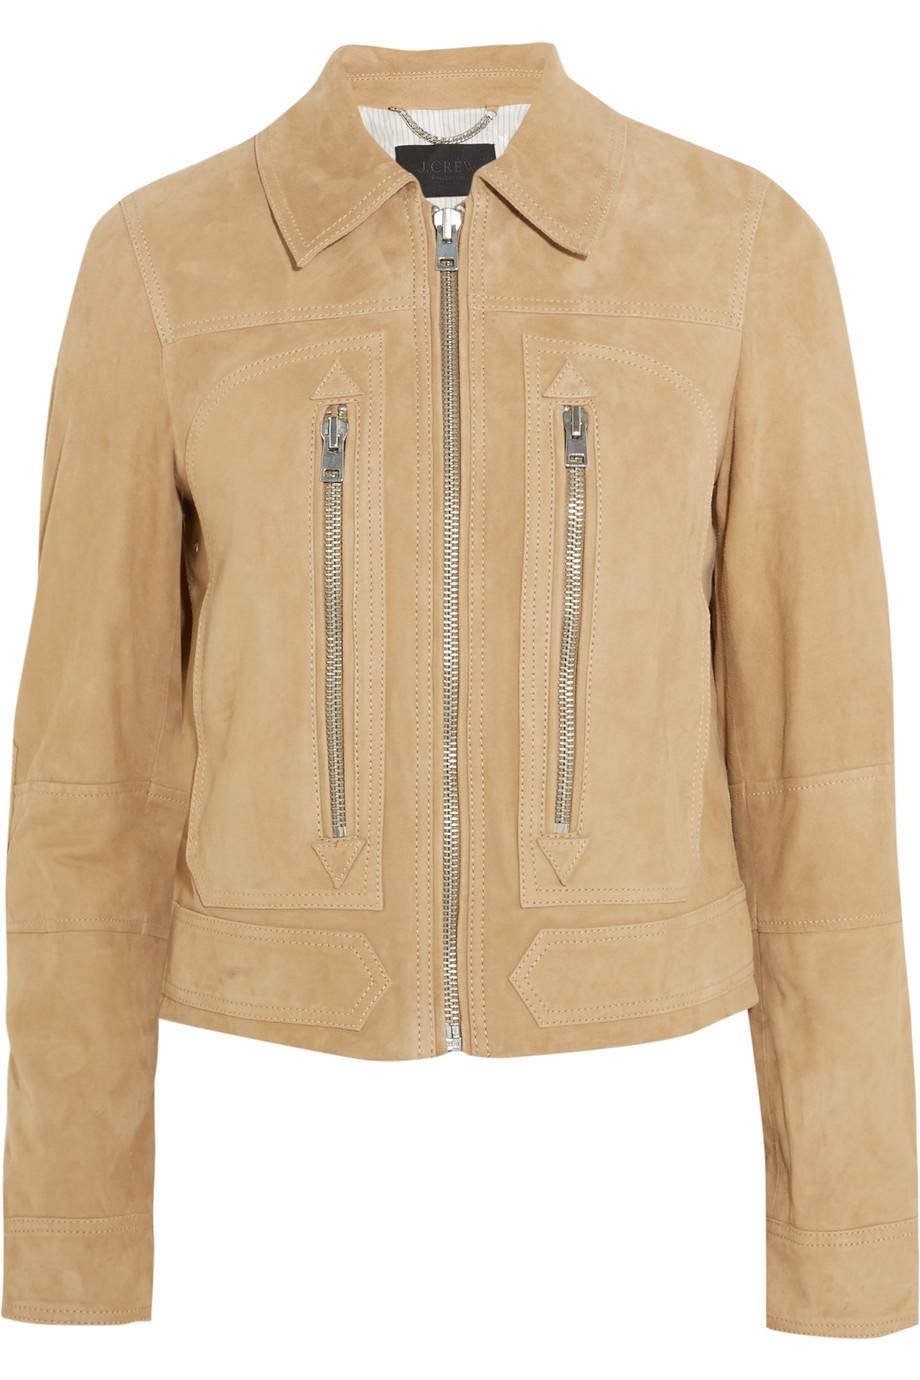 J.Crew Collection Suede Biker Jacket, Camel, Women's, Size: 0